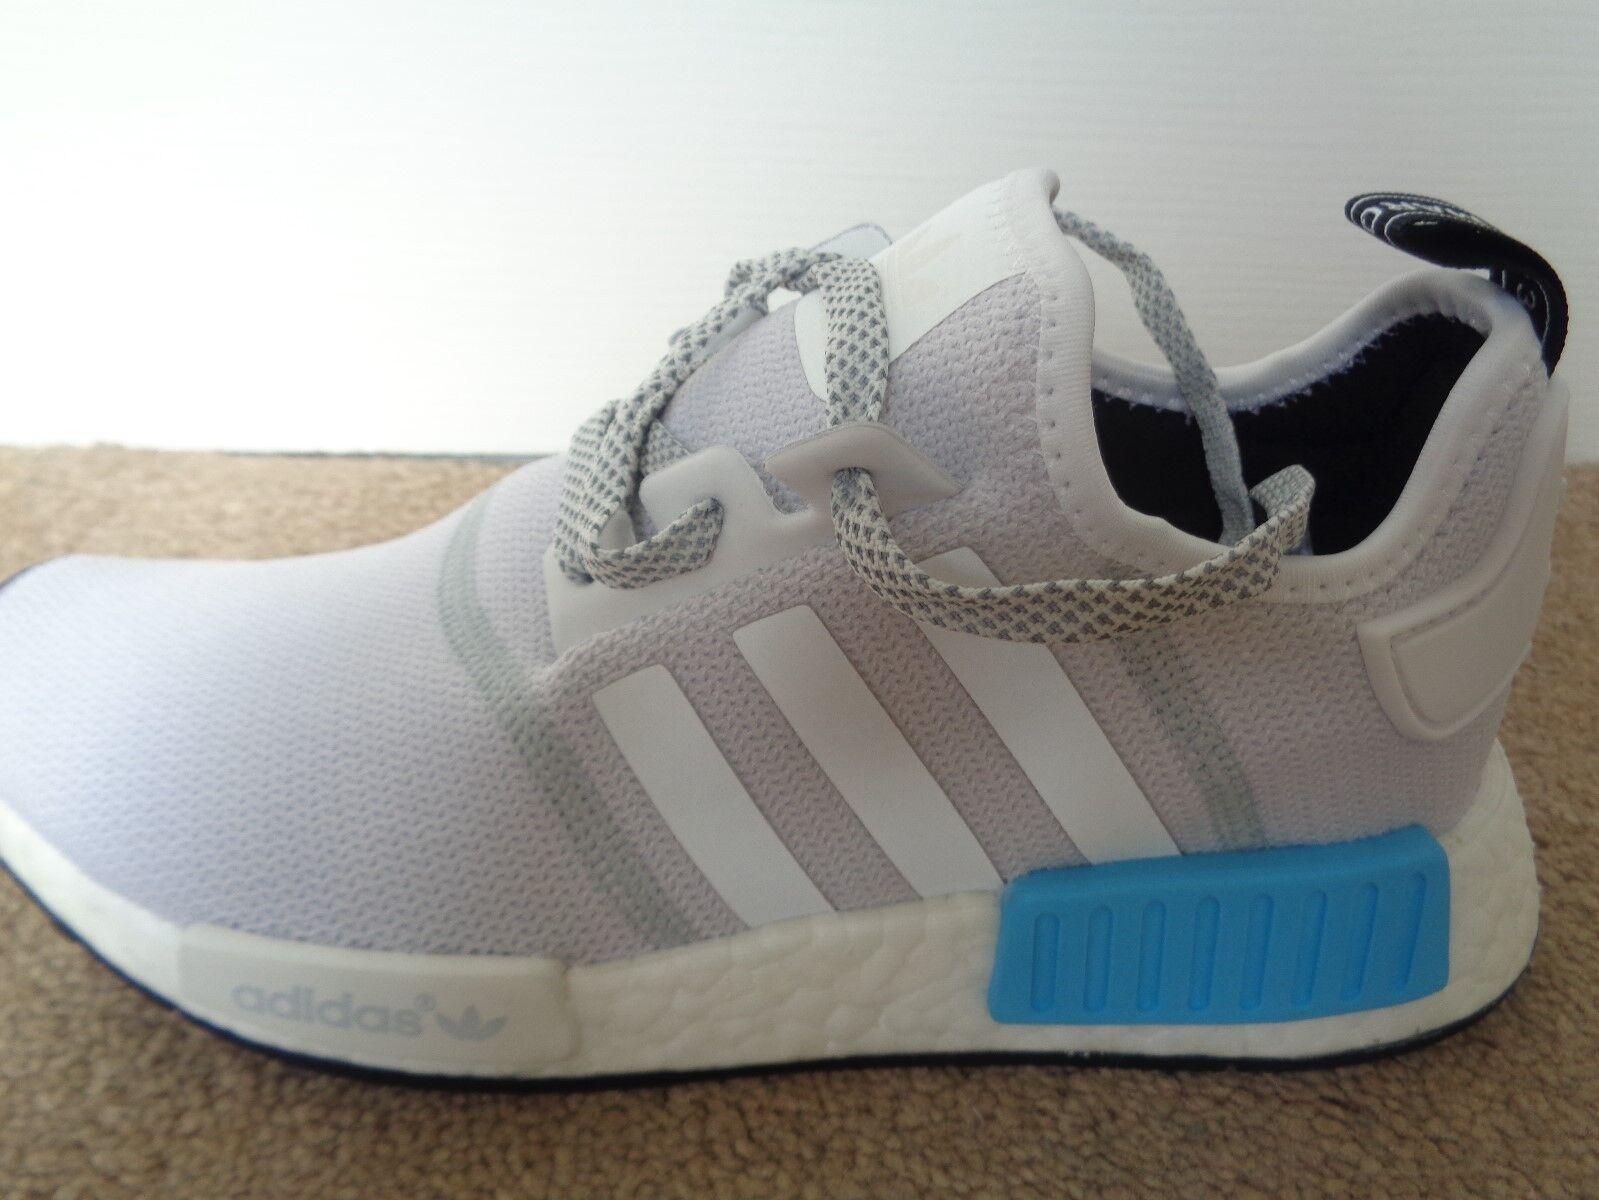 Adidas originals NMD_R1 trainers eu sneakers S31511 uk 6.5 eu trainers 40 us 7 NEW+BOX 32d4dd